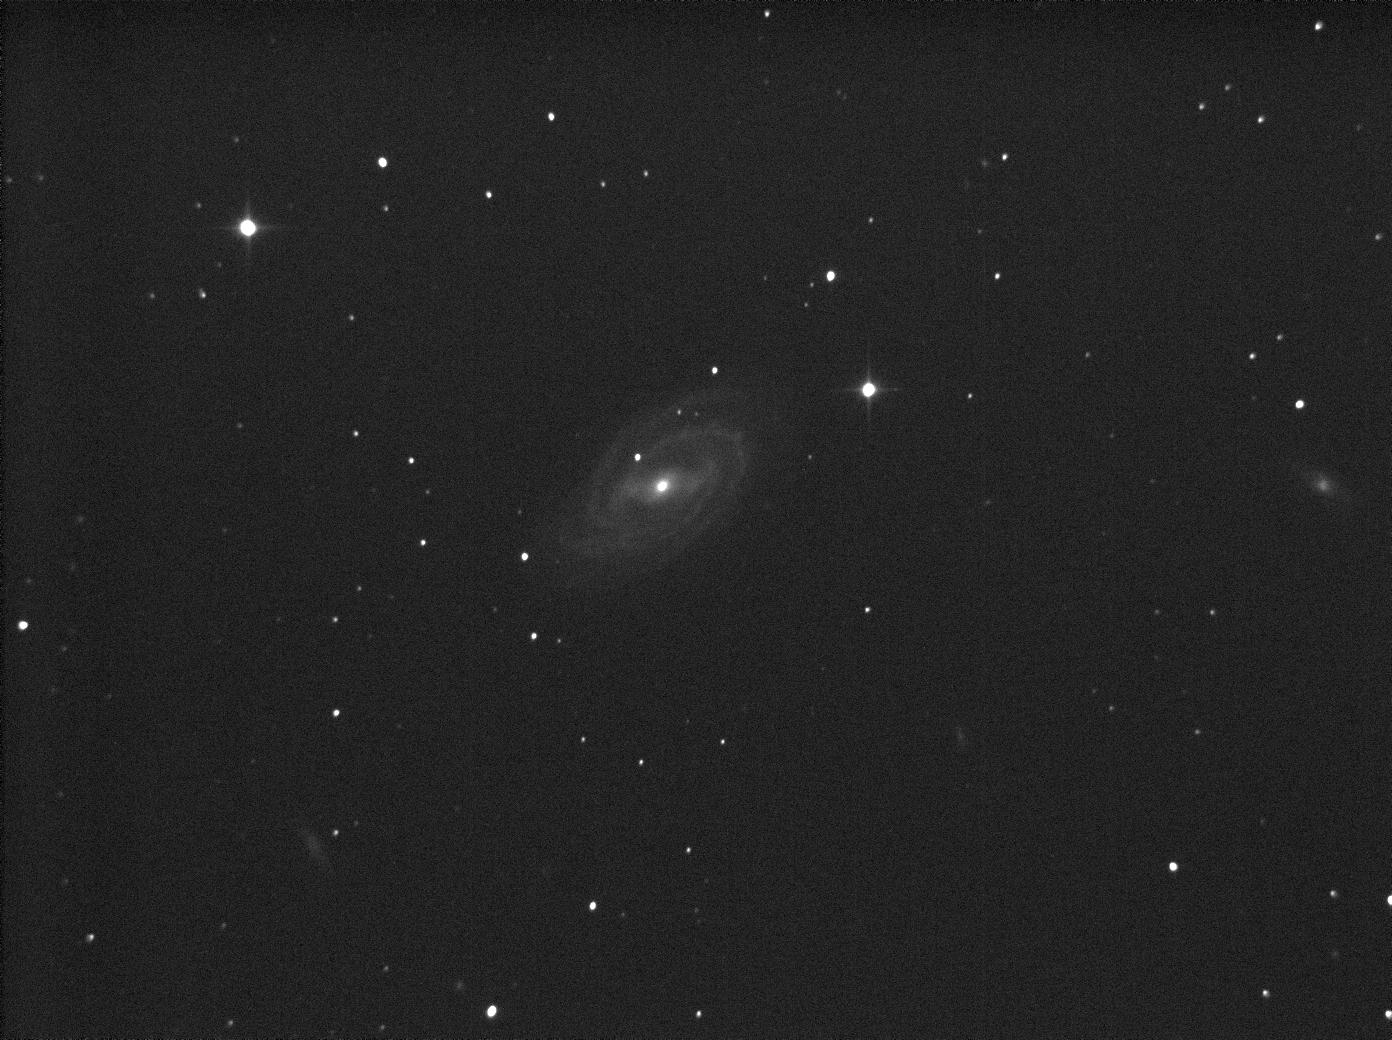 M109 16x10s   B1   CLSCCD